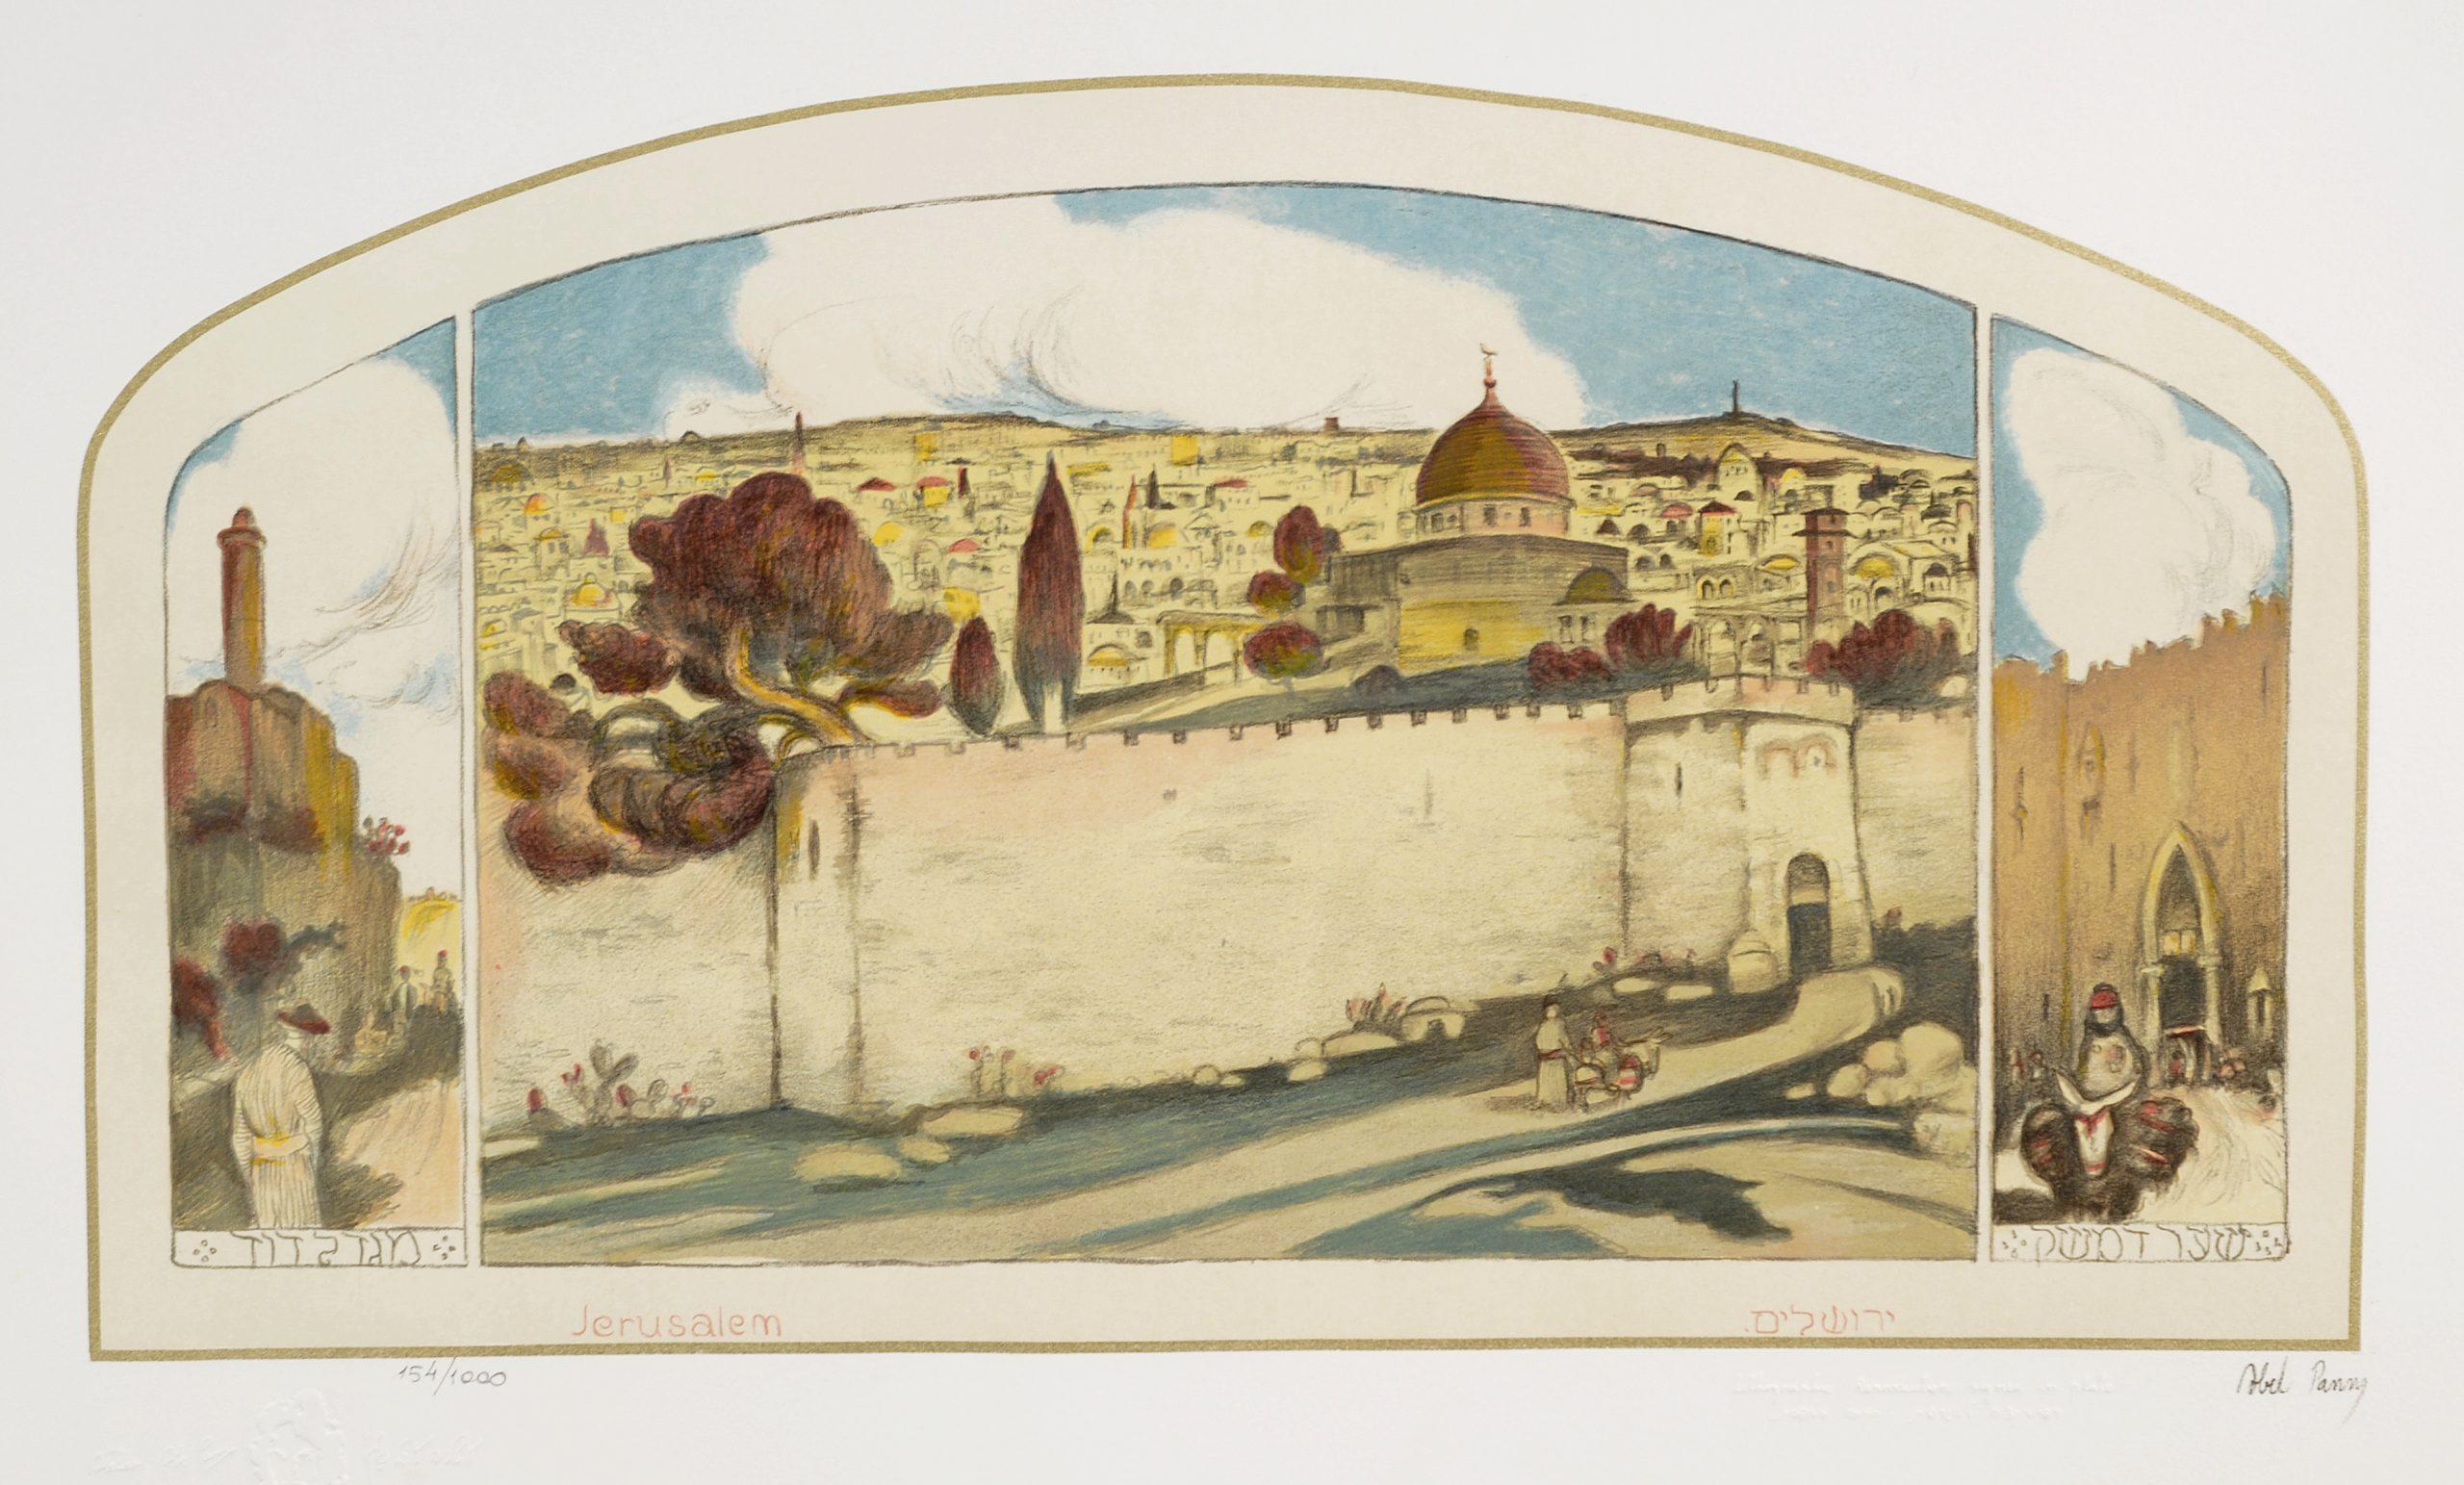 Jerusalem by  Abel Pann